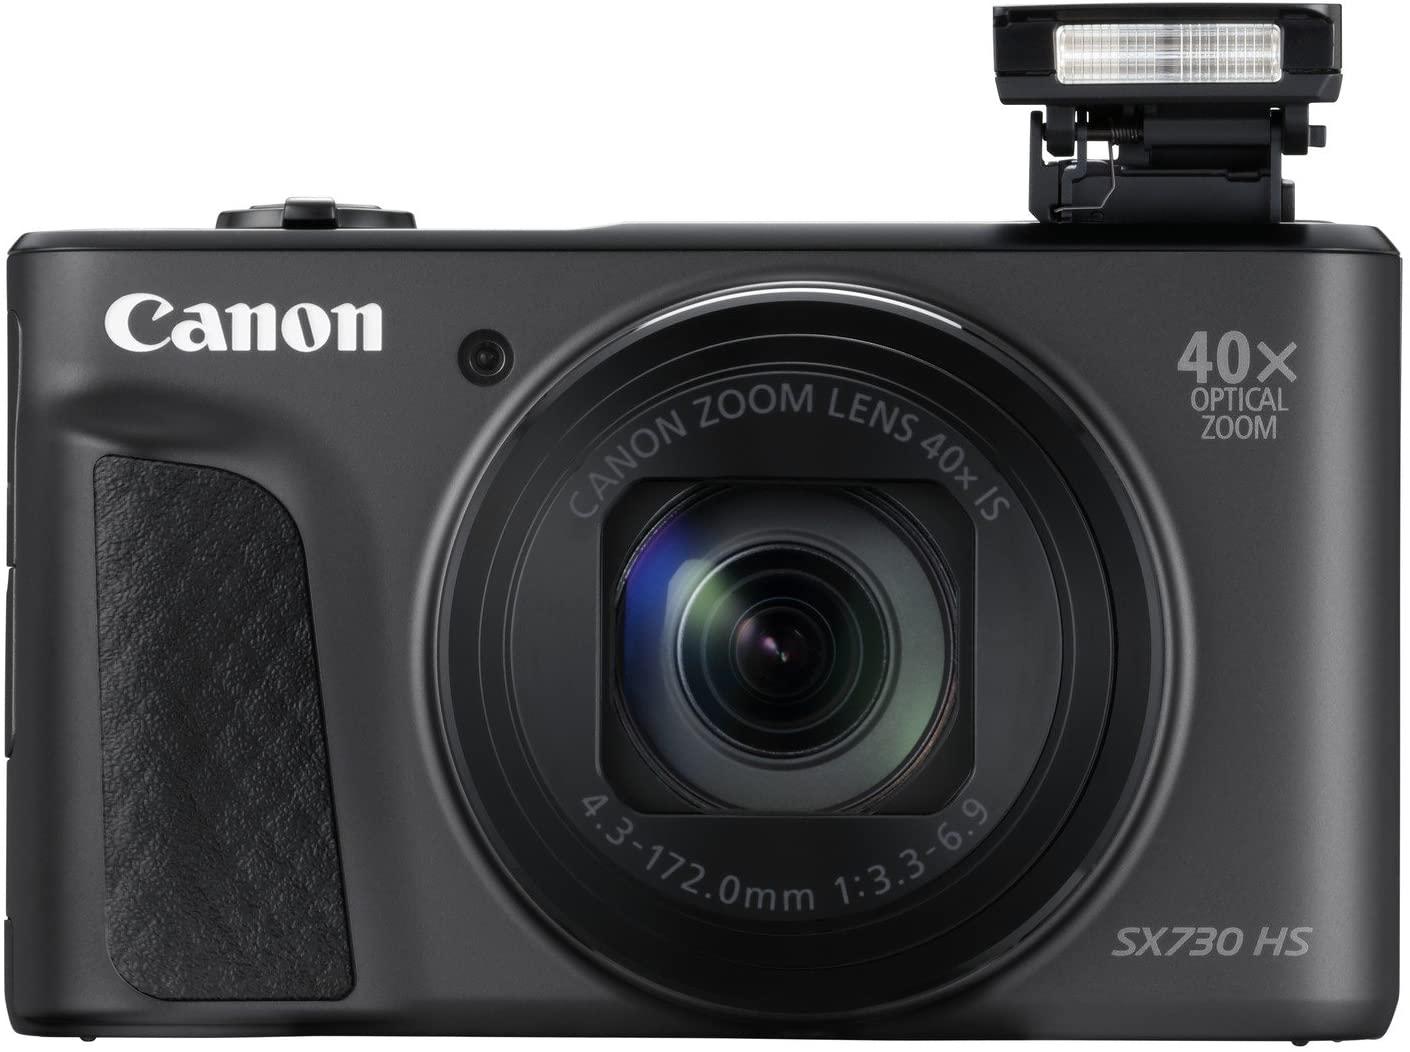 camara-compacta-digital-canon-powershot-sx730-hs.jpg